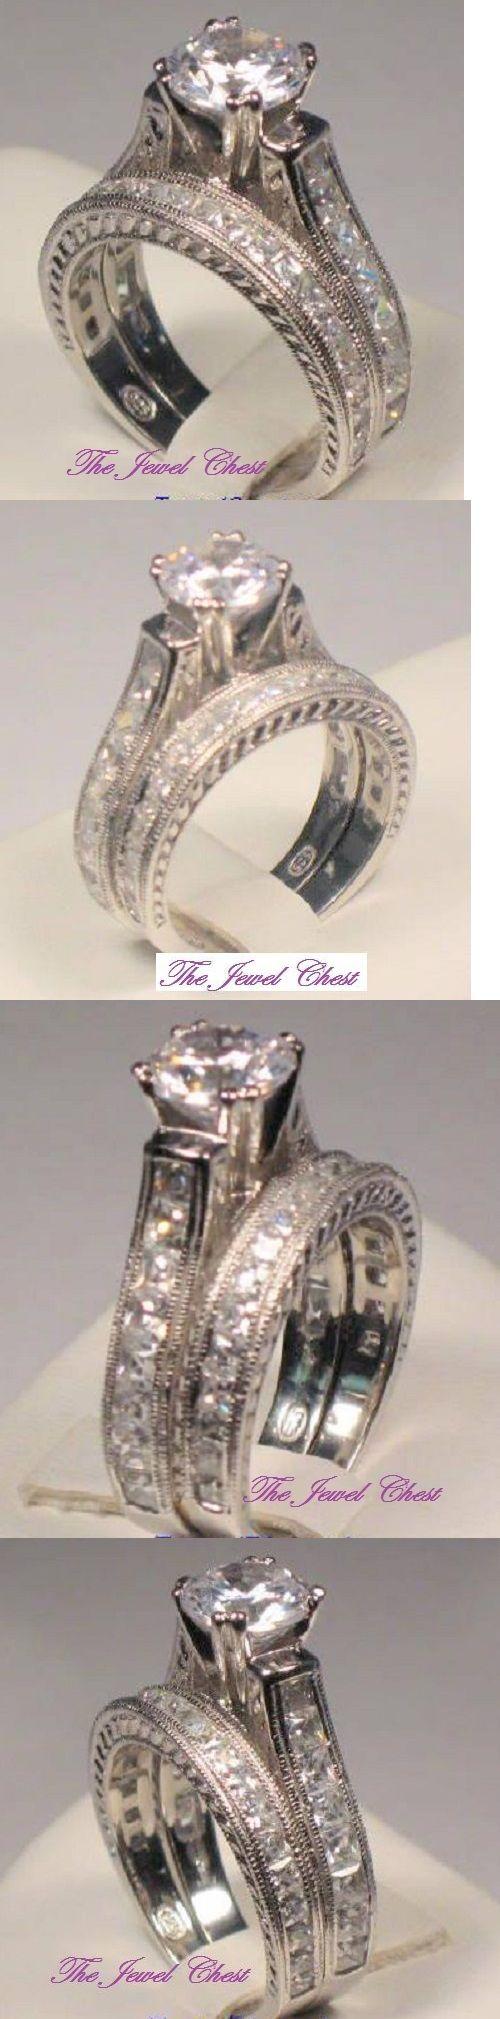 ebay eheringe ebay wedding rings sets Other Wedding Ring Sets Ladies Round Princess Cut Diamond Engagement Ring Bridal Wedding Set